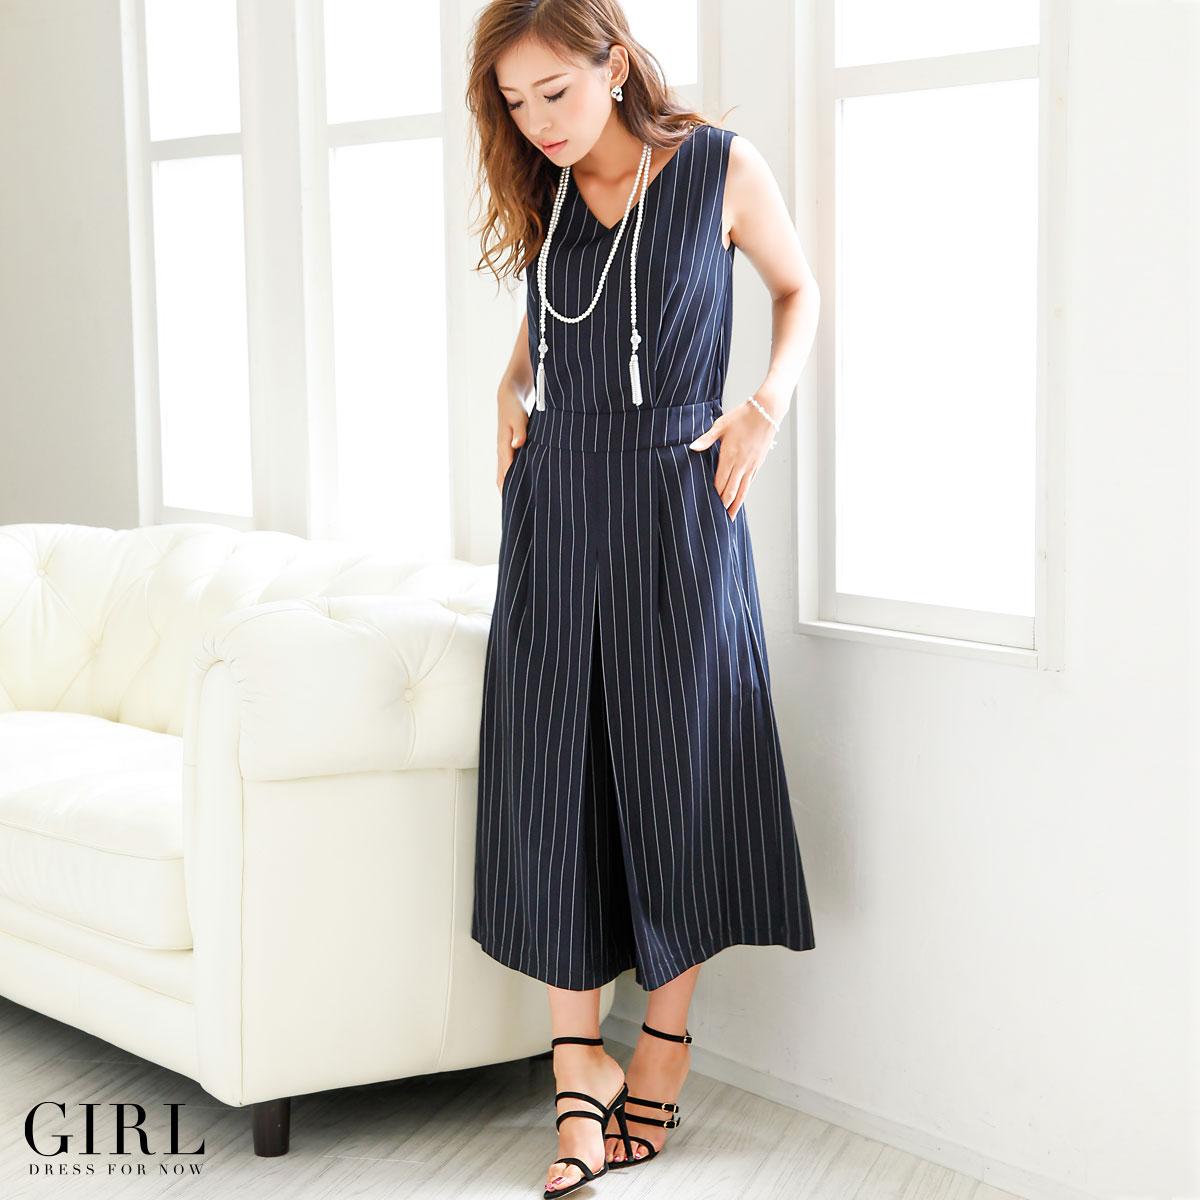 Dress shop GIRL | Rakuten Global Market: Party pants dress wedding ...